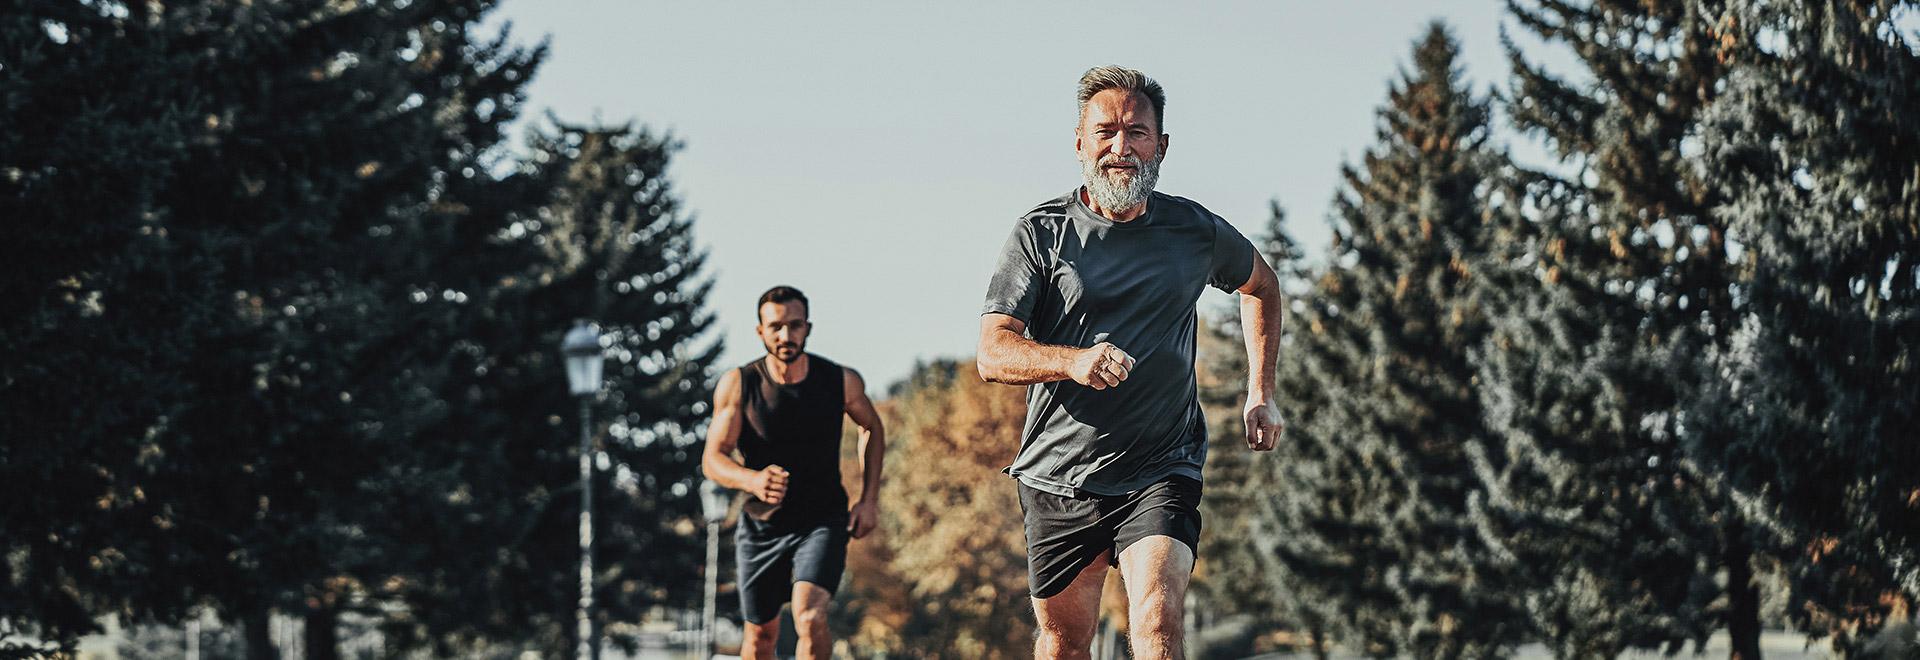 ondeso-jogger-durchsetzungsvermoegen-header